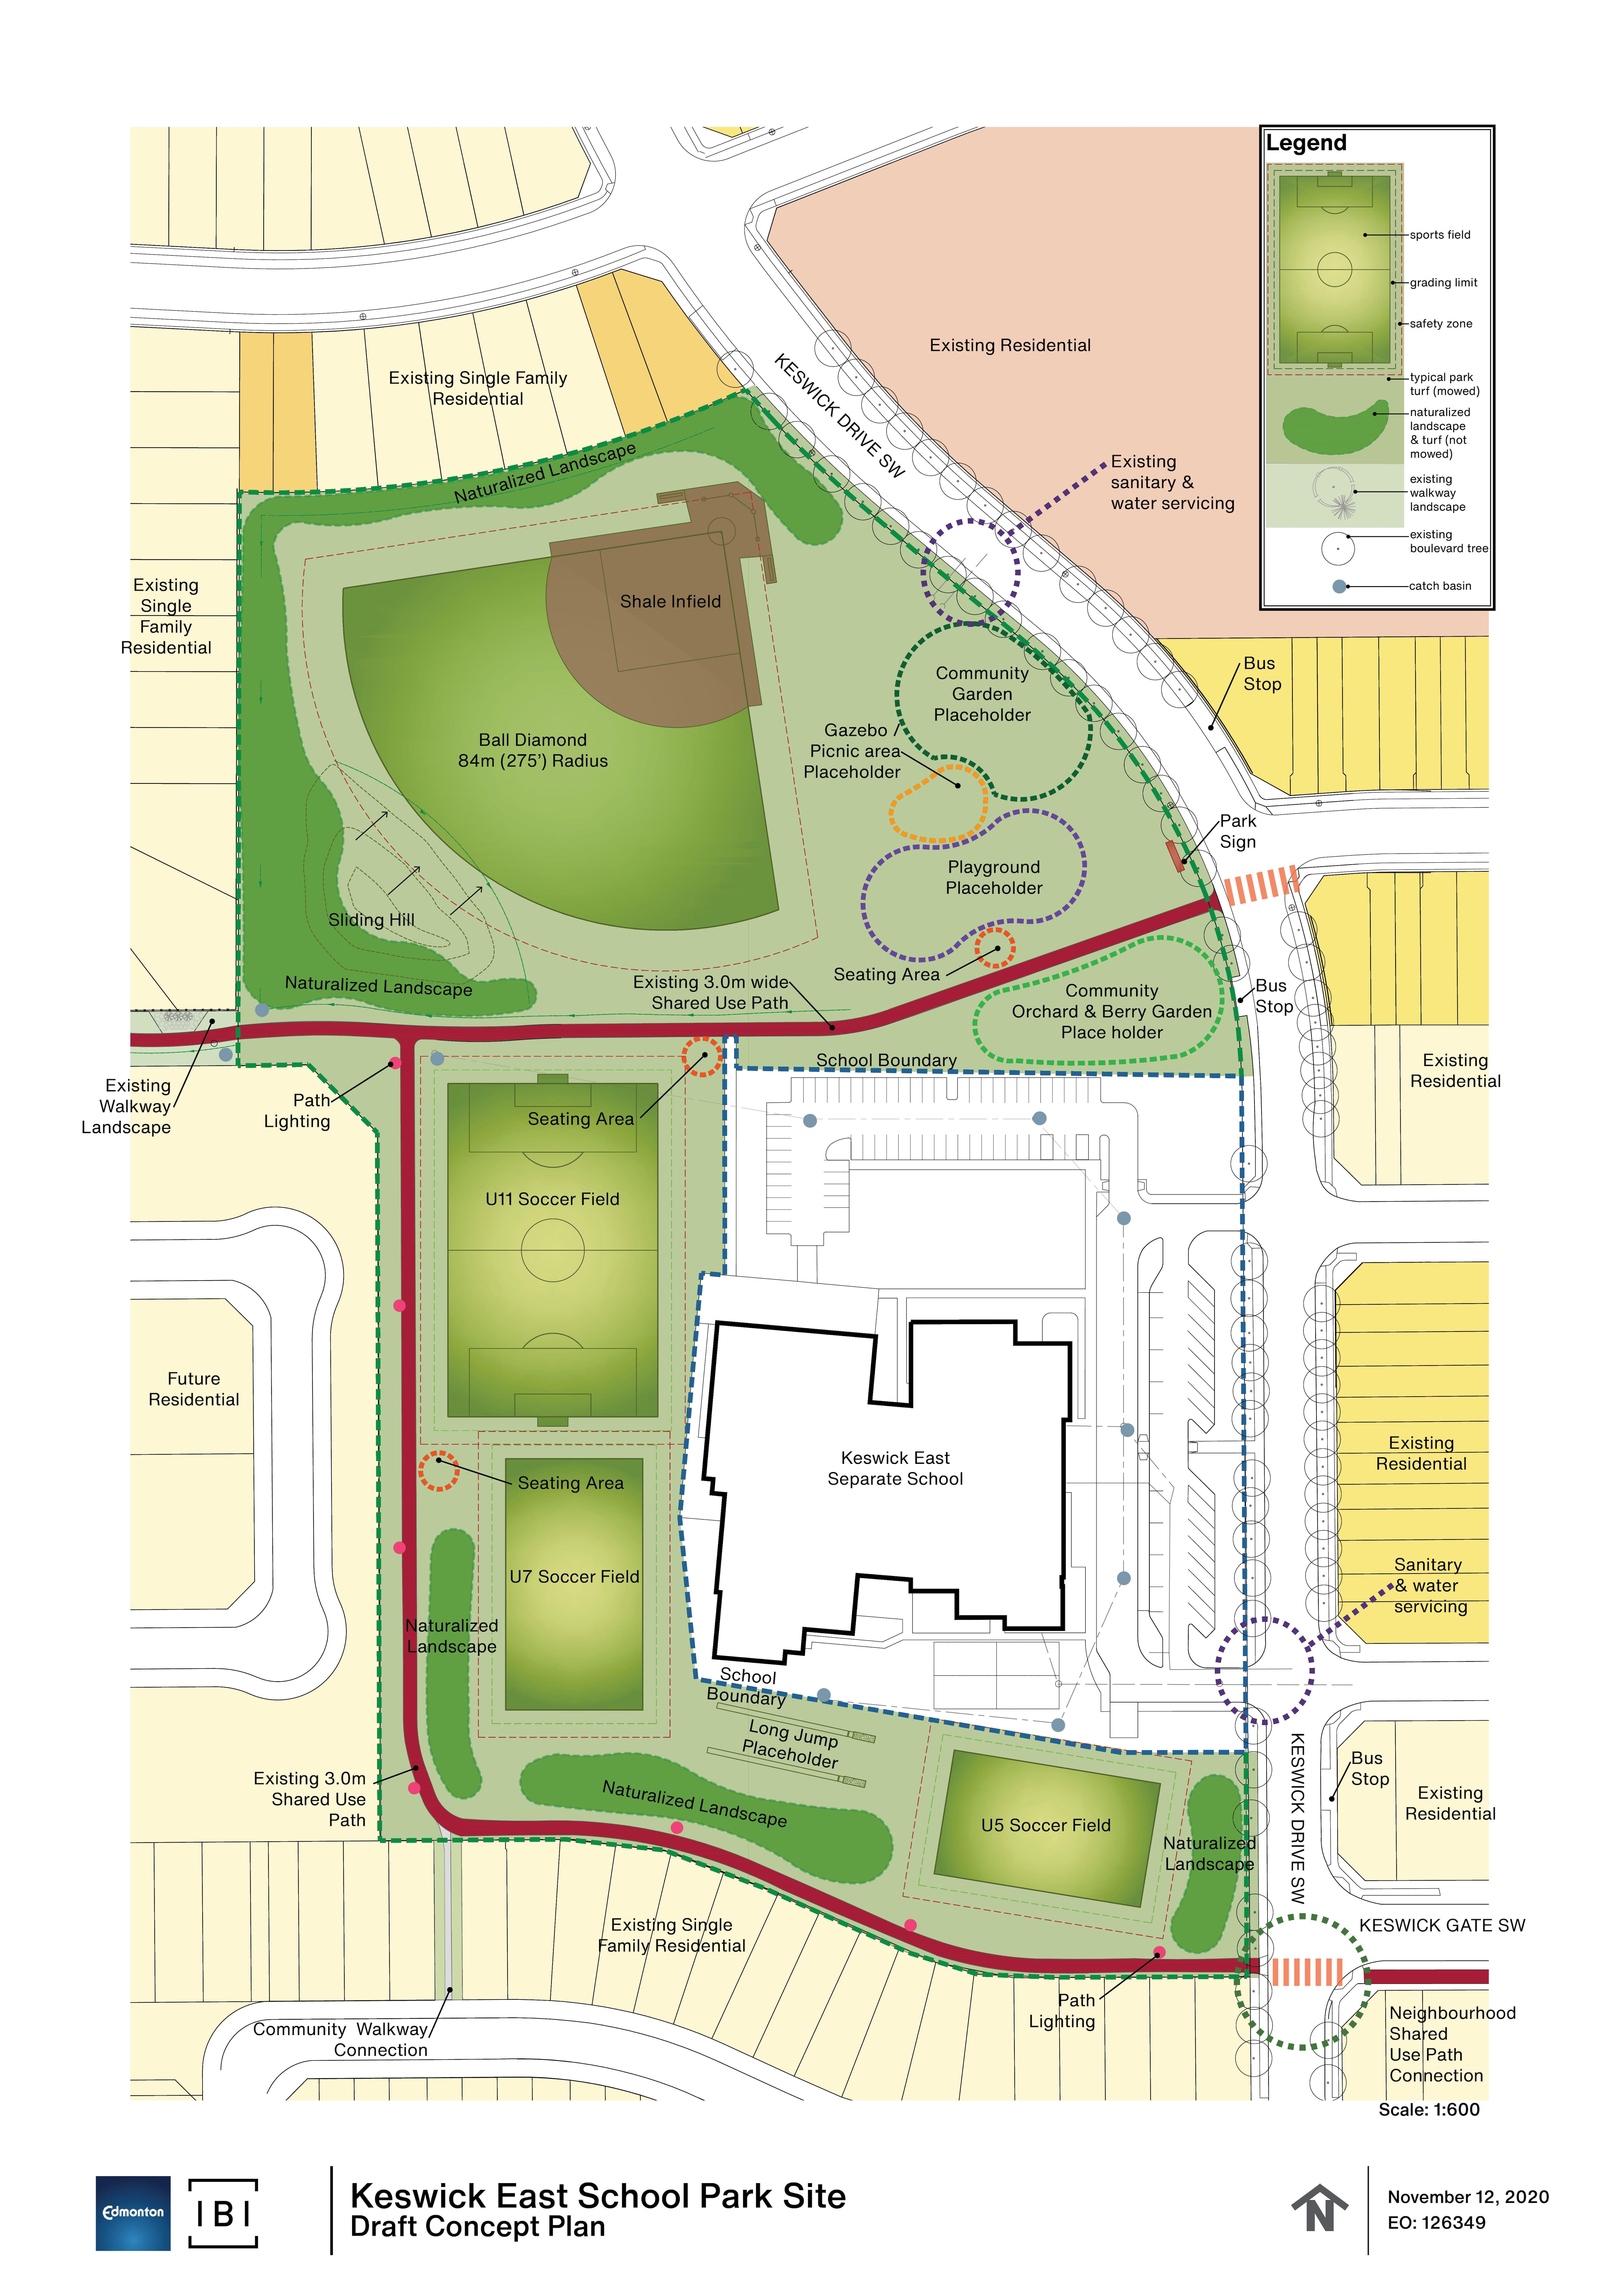 Keswick East Final Draft Concept Plan for Public Engagement 2020-11-12.jpg